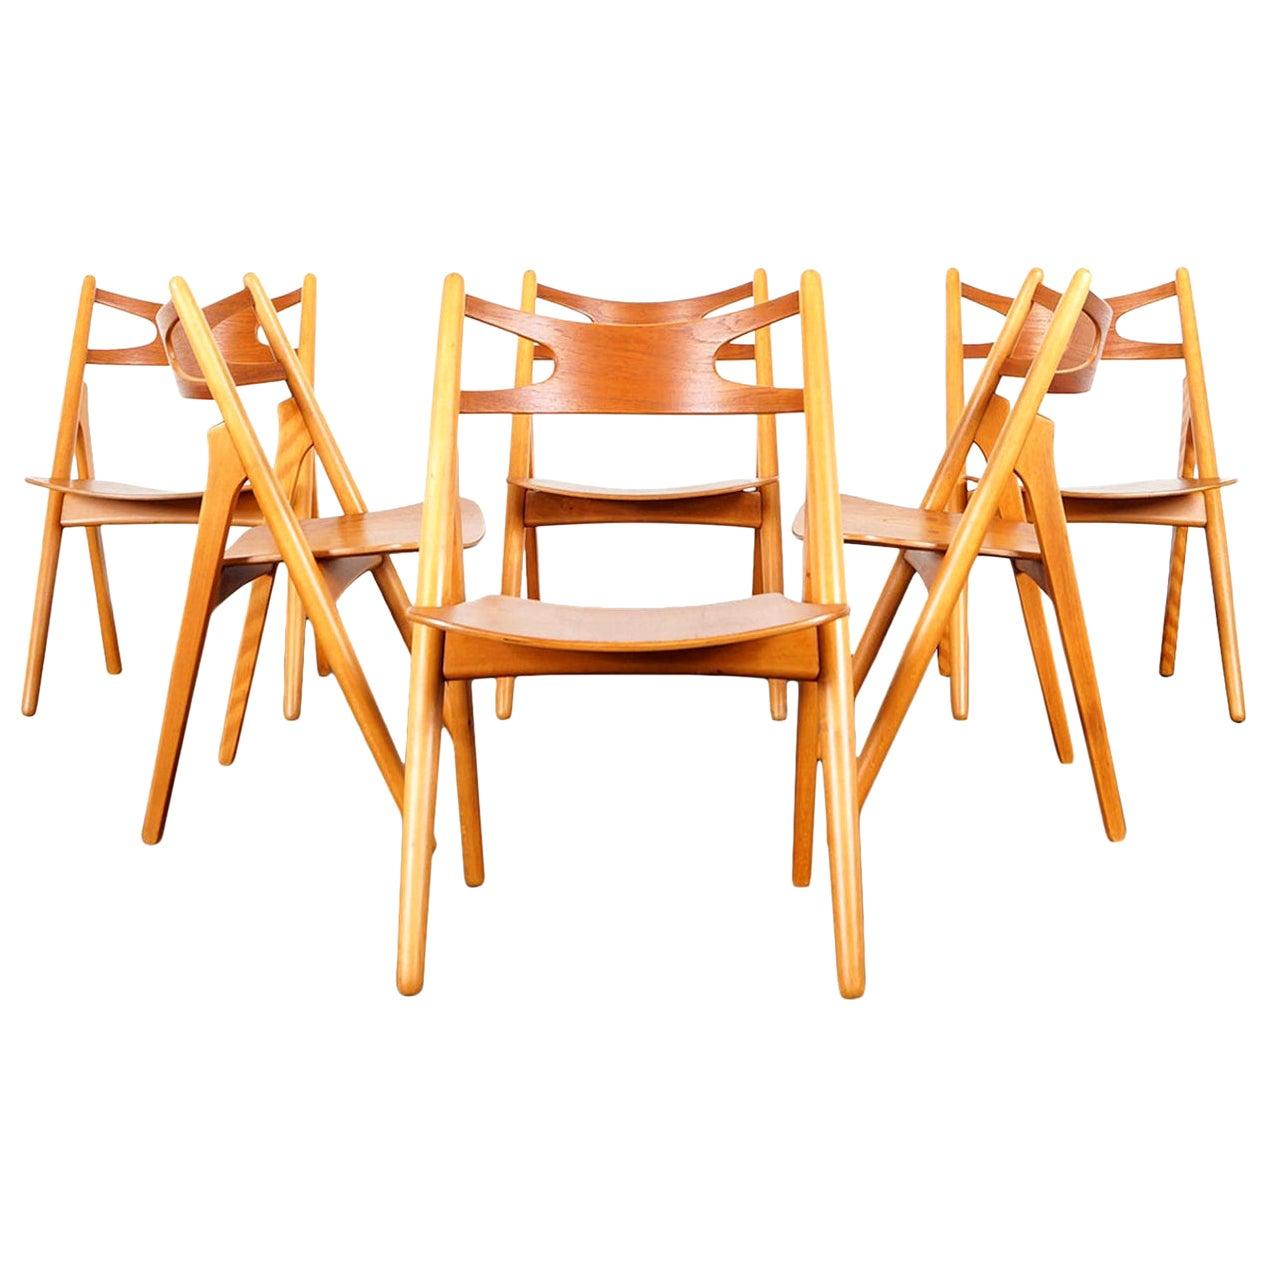 Danish Modern 'Sawbuck' CH-29 Dining Chairs by Hans J. Wegner